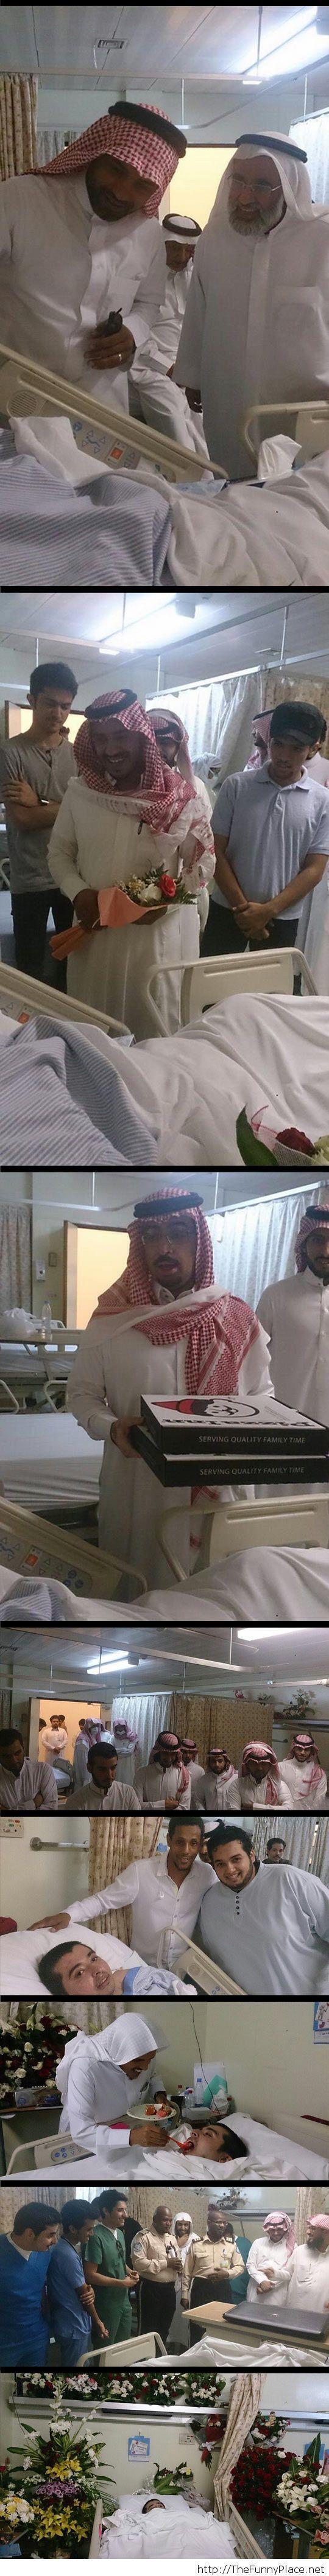 Lonely Saudi boy got a big surprise